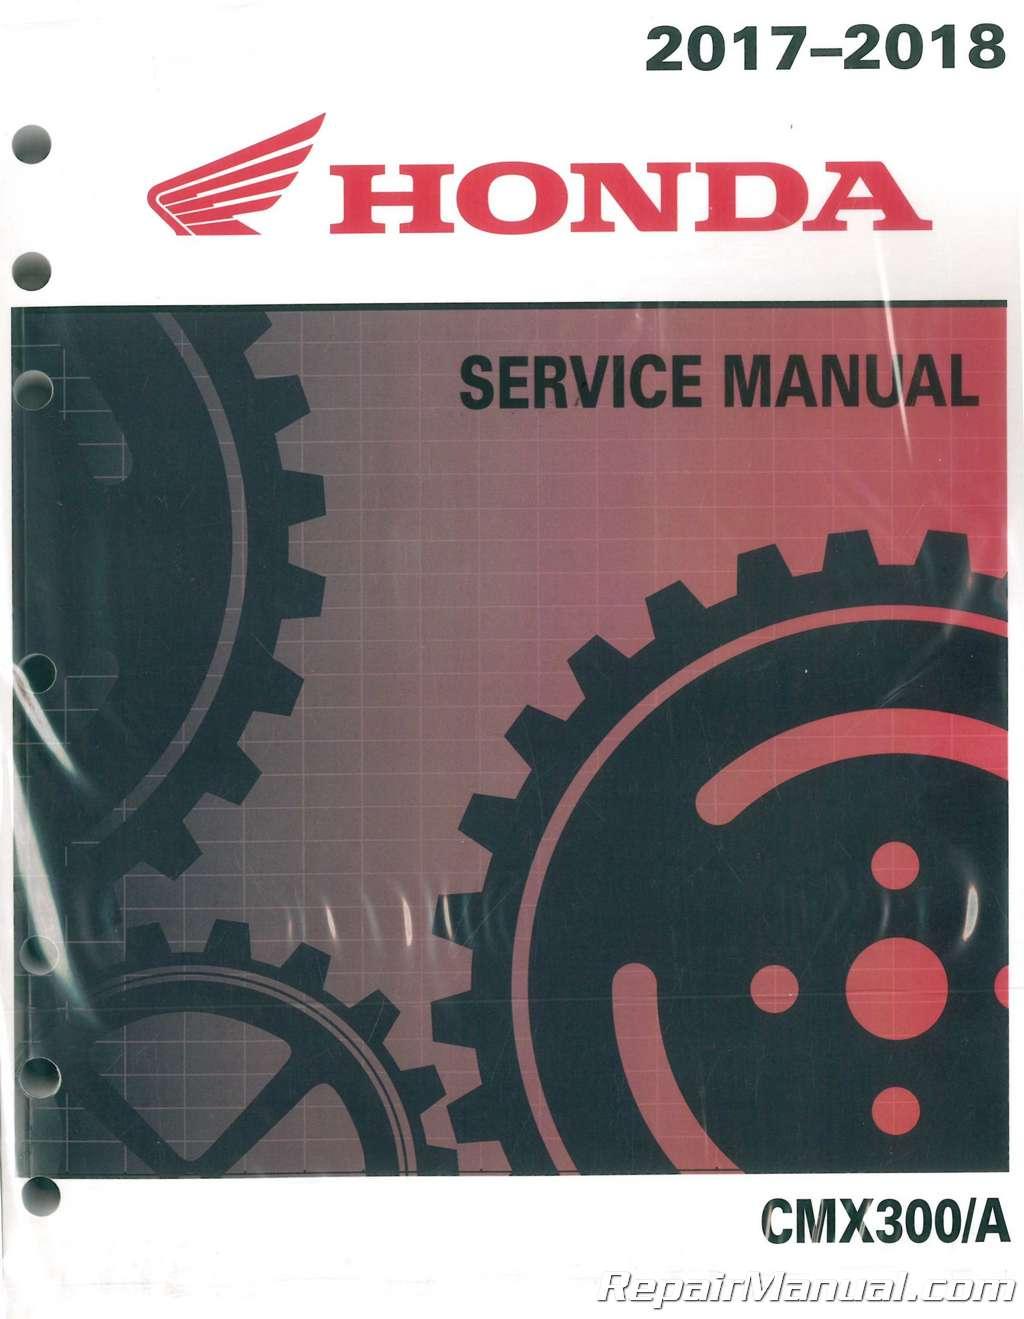 2017 – 2018 Honda CMX300/A Rebel Motorcycle Service Manual